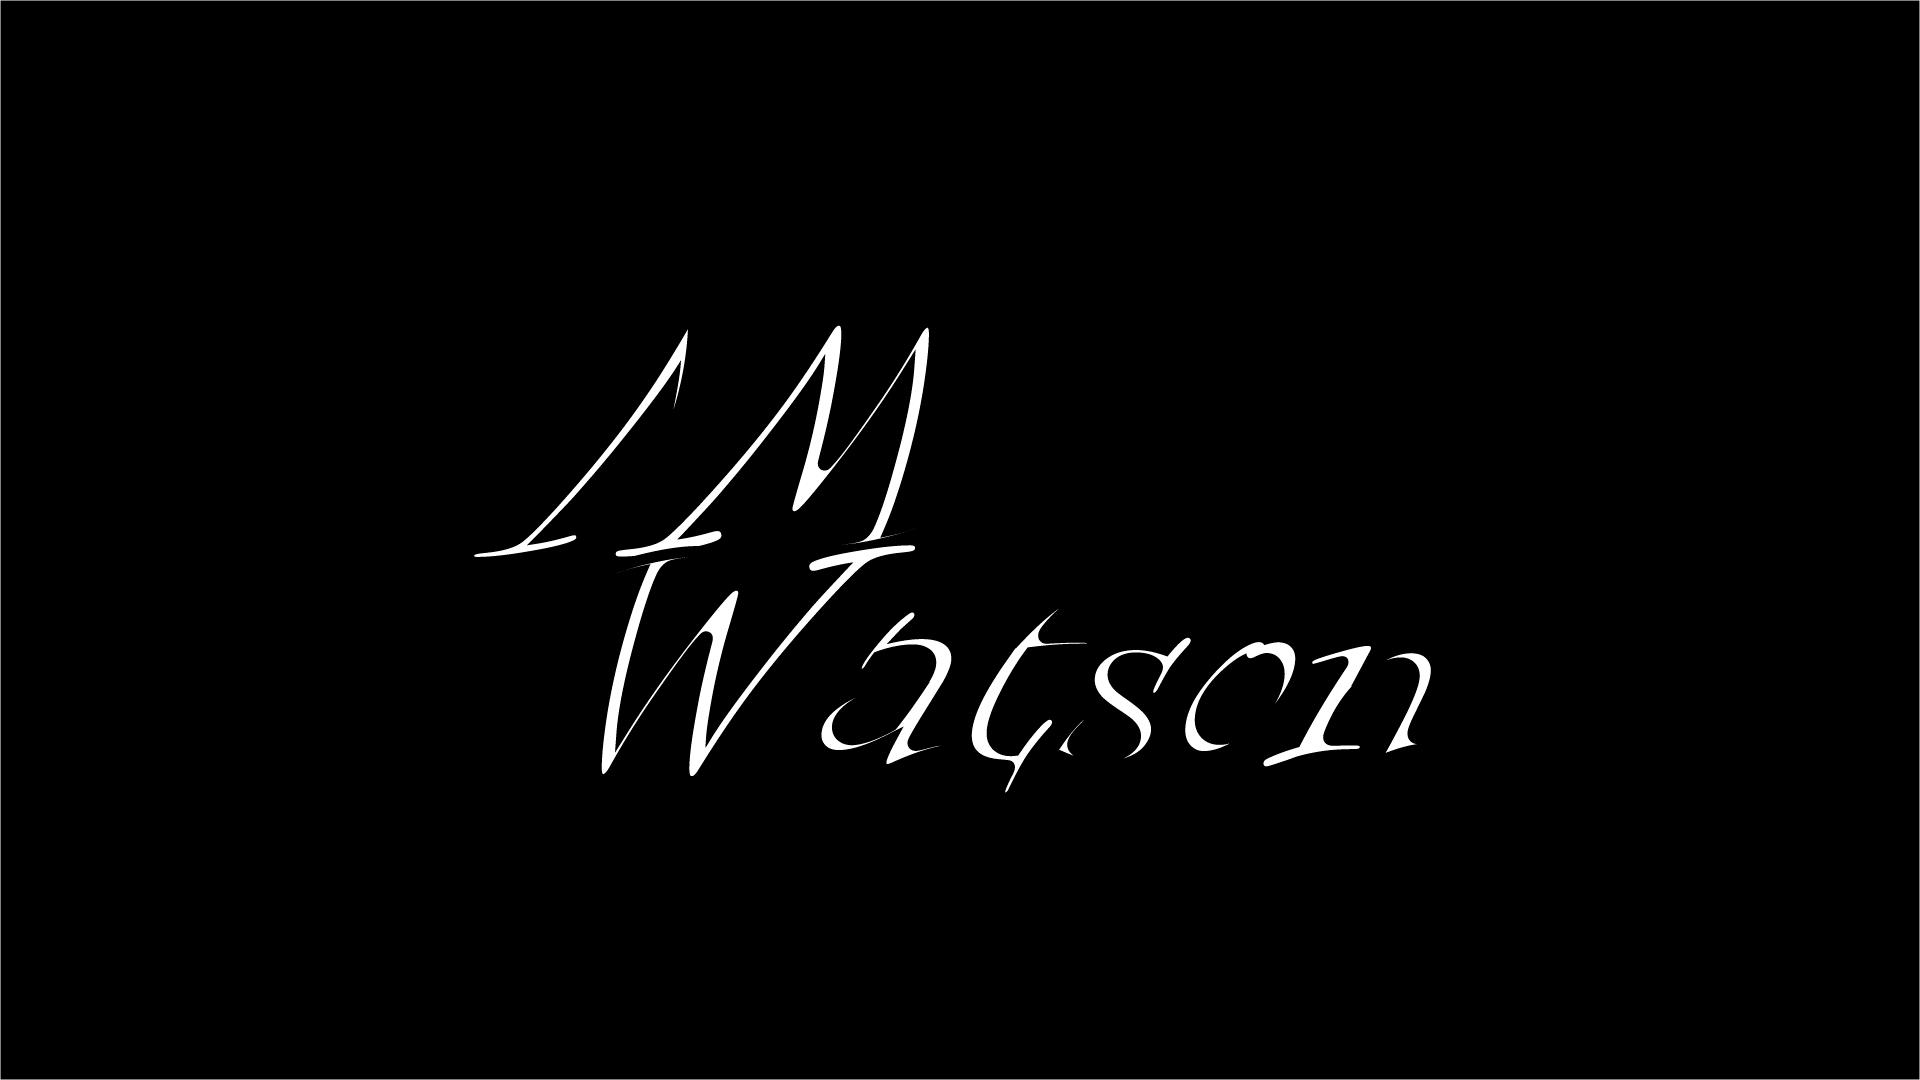 Разработать логотип для балетного бренда фото f_7665bc32037a3477.png